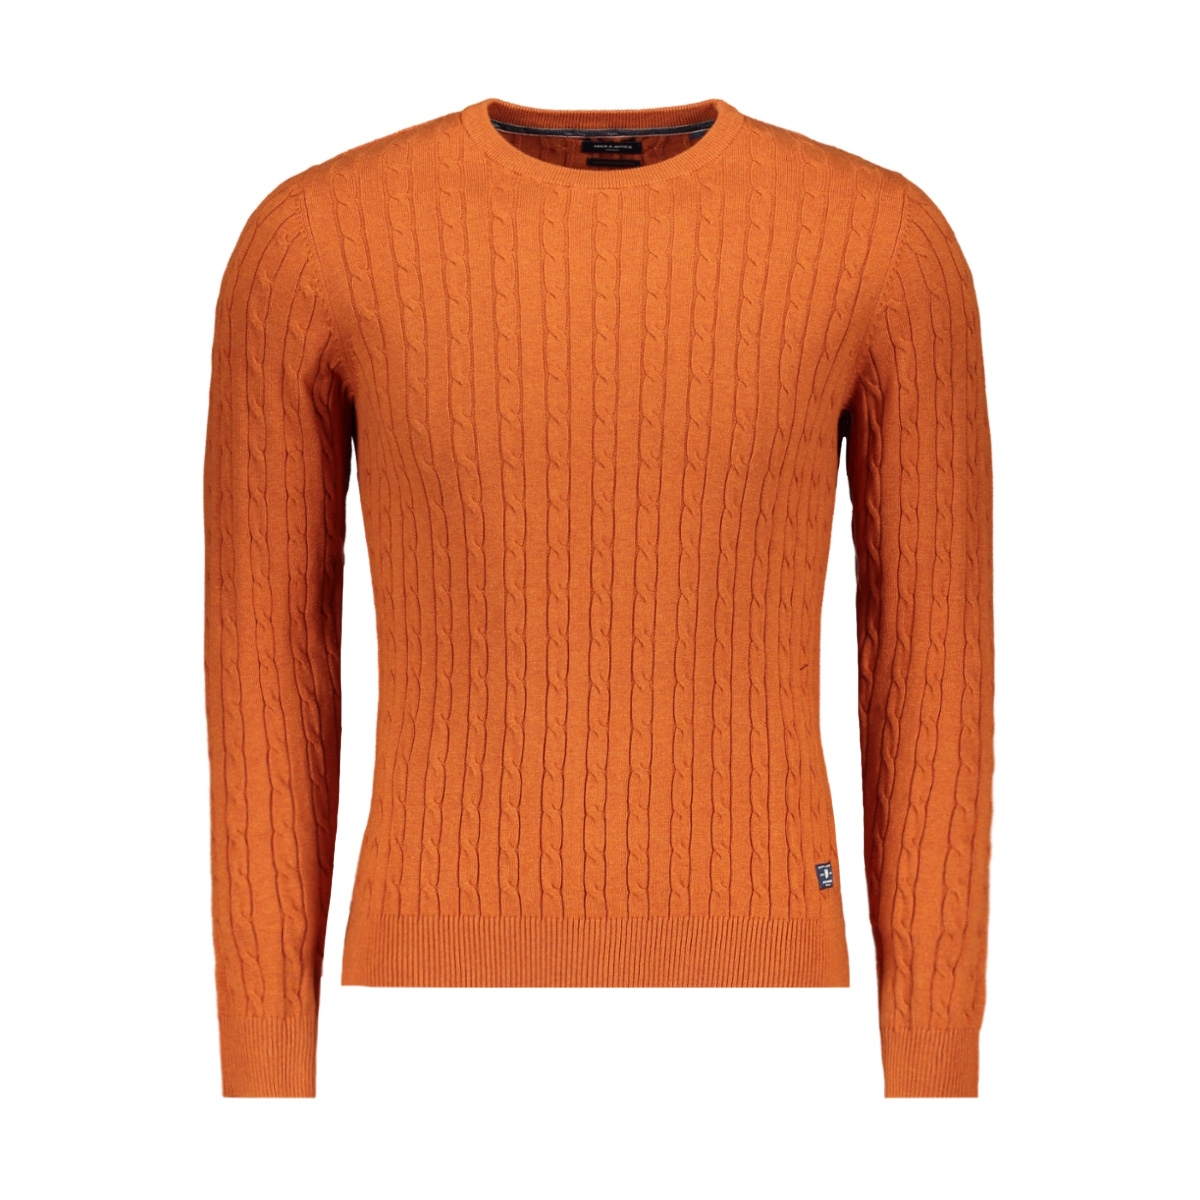 jprrichard knit crew neck 12155363 jack & jones trui cinnamon stick/melange